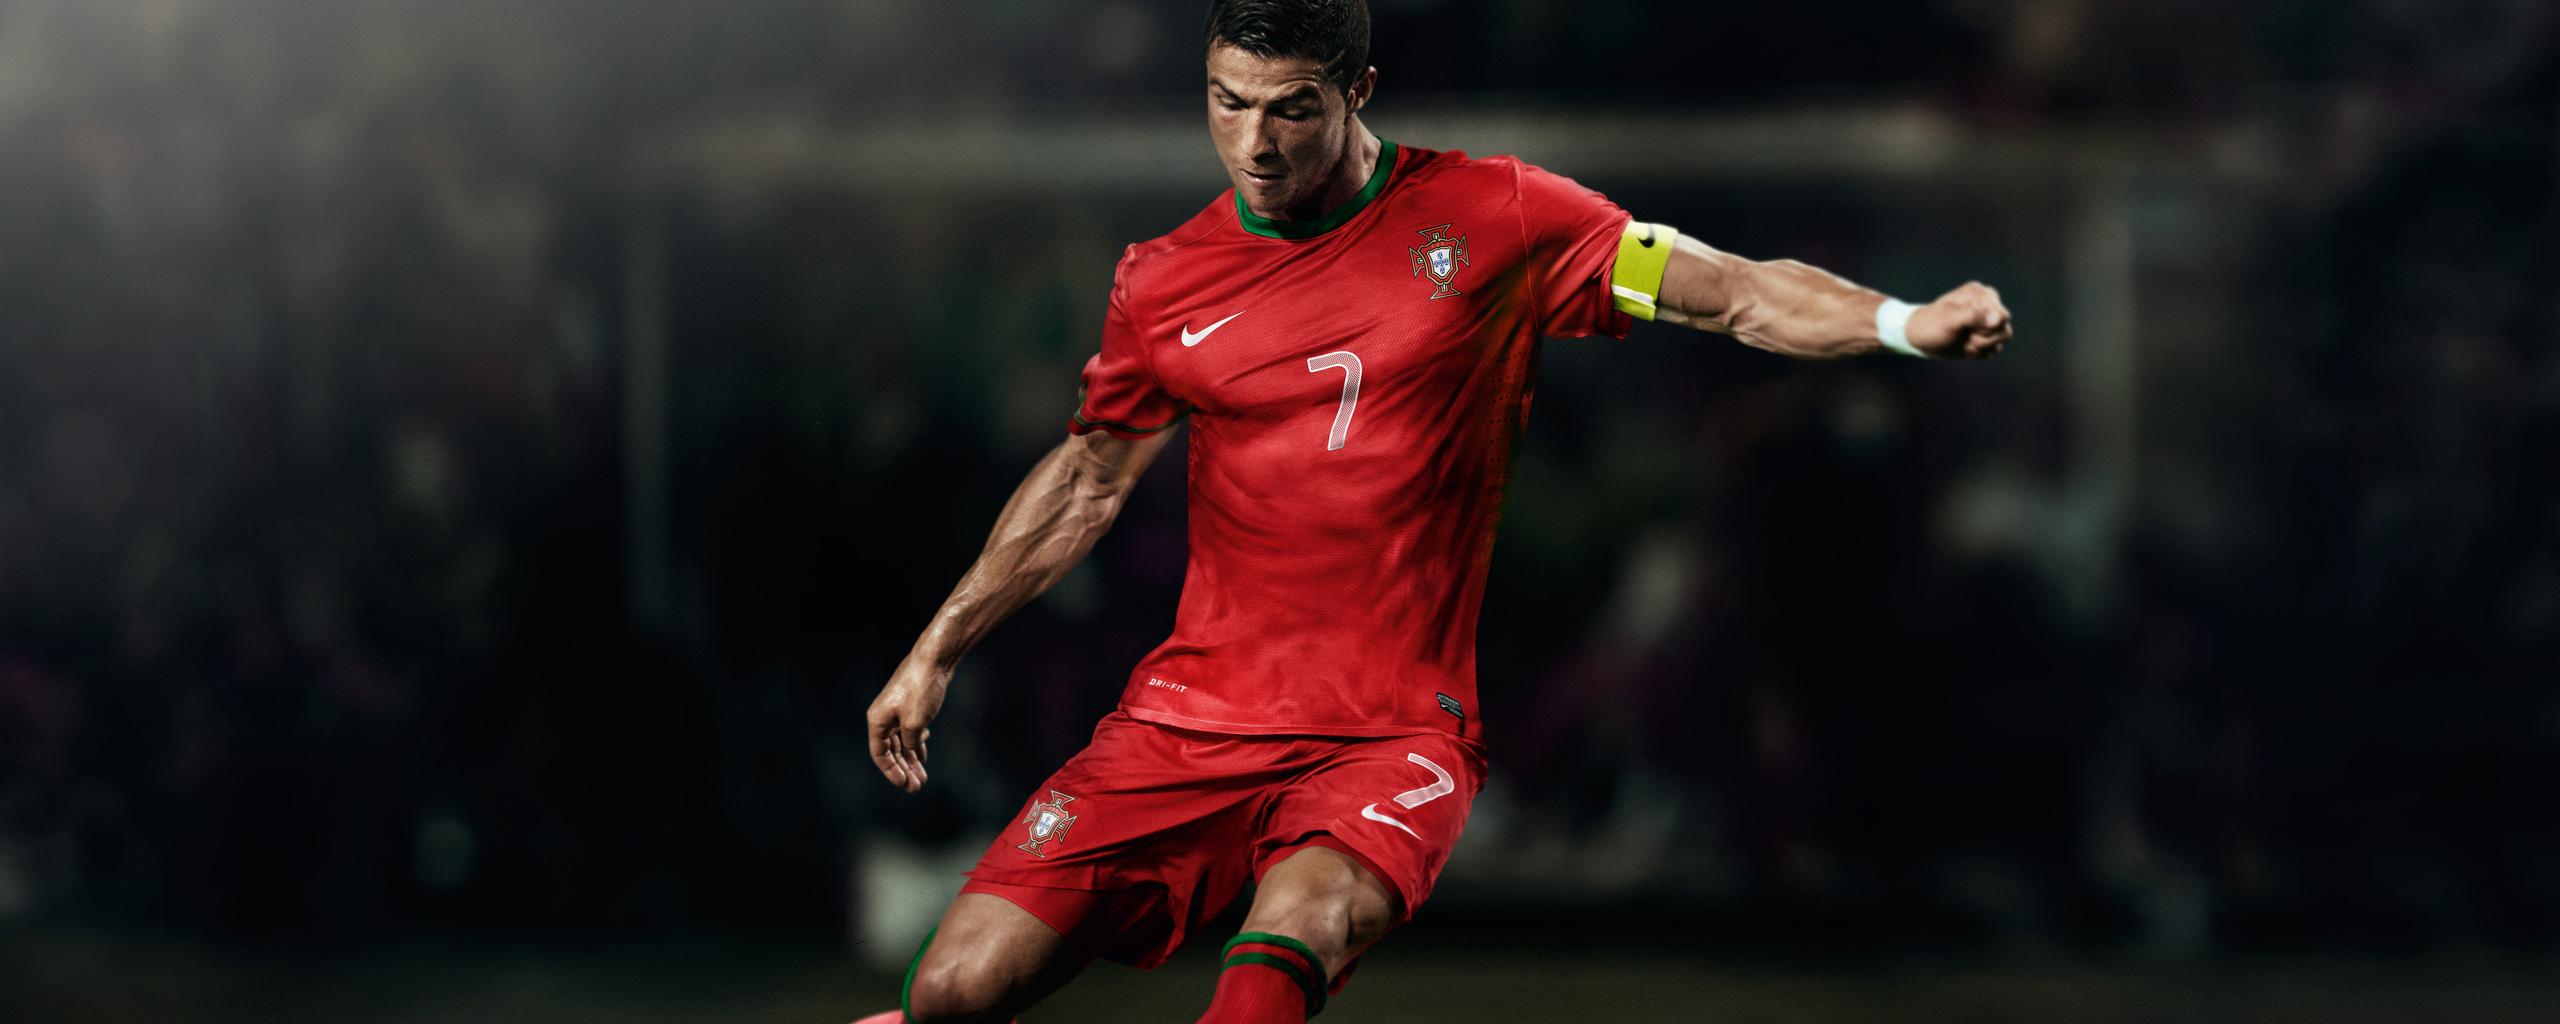 cristiano-ronaldo-soccer-player-8k-16.jpg